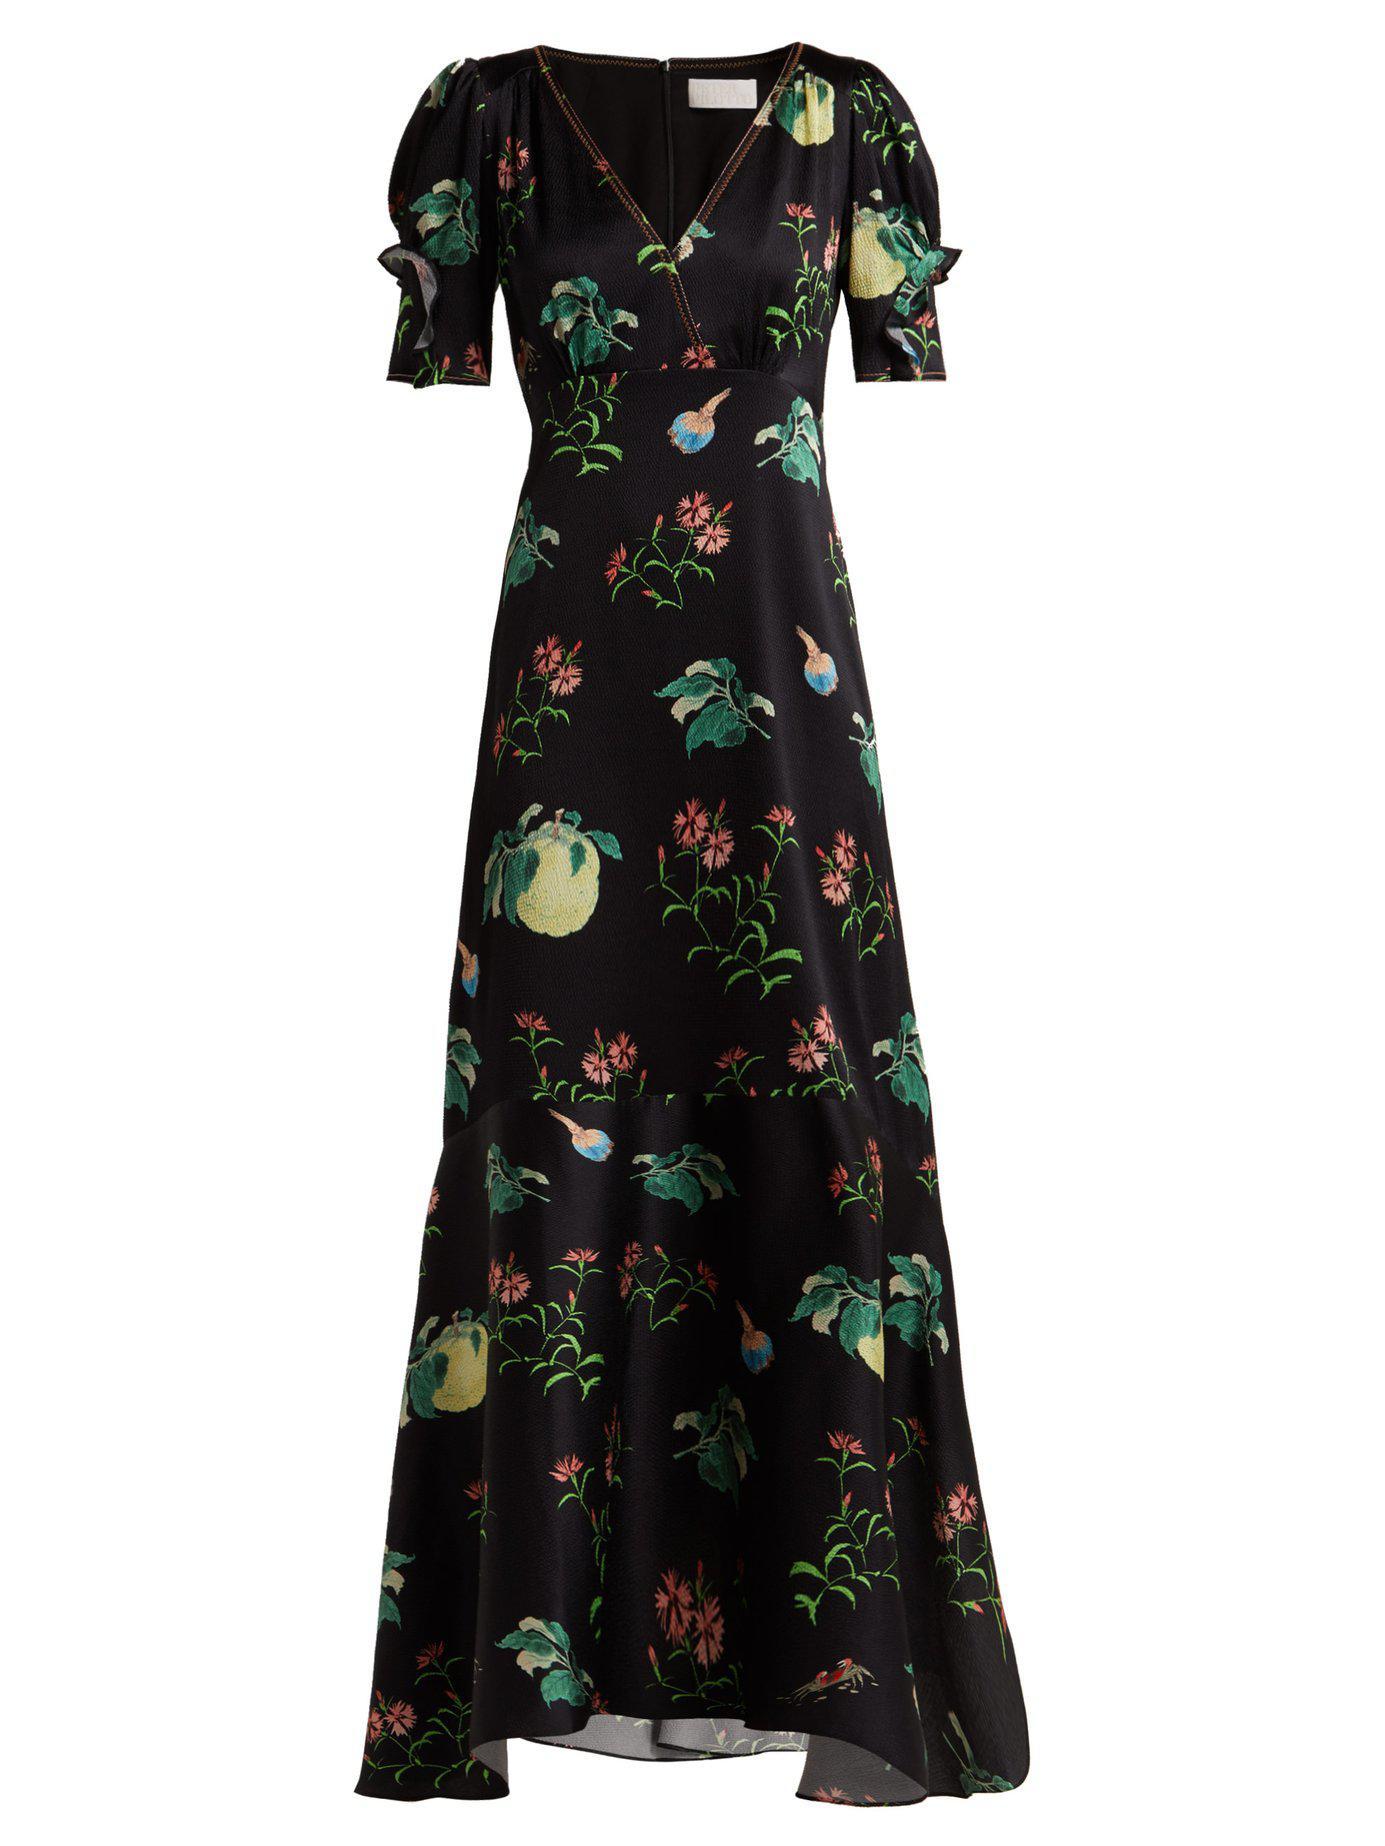 72ef3564787 Lyst - Peter Pilotto Fruit Print Silk Midi Dress in Black